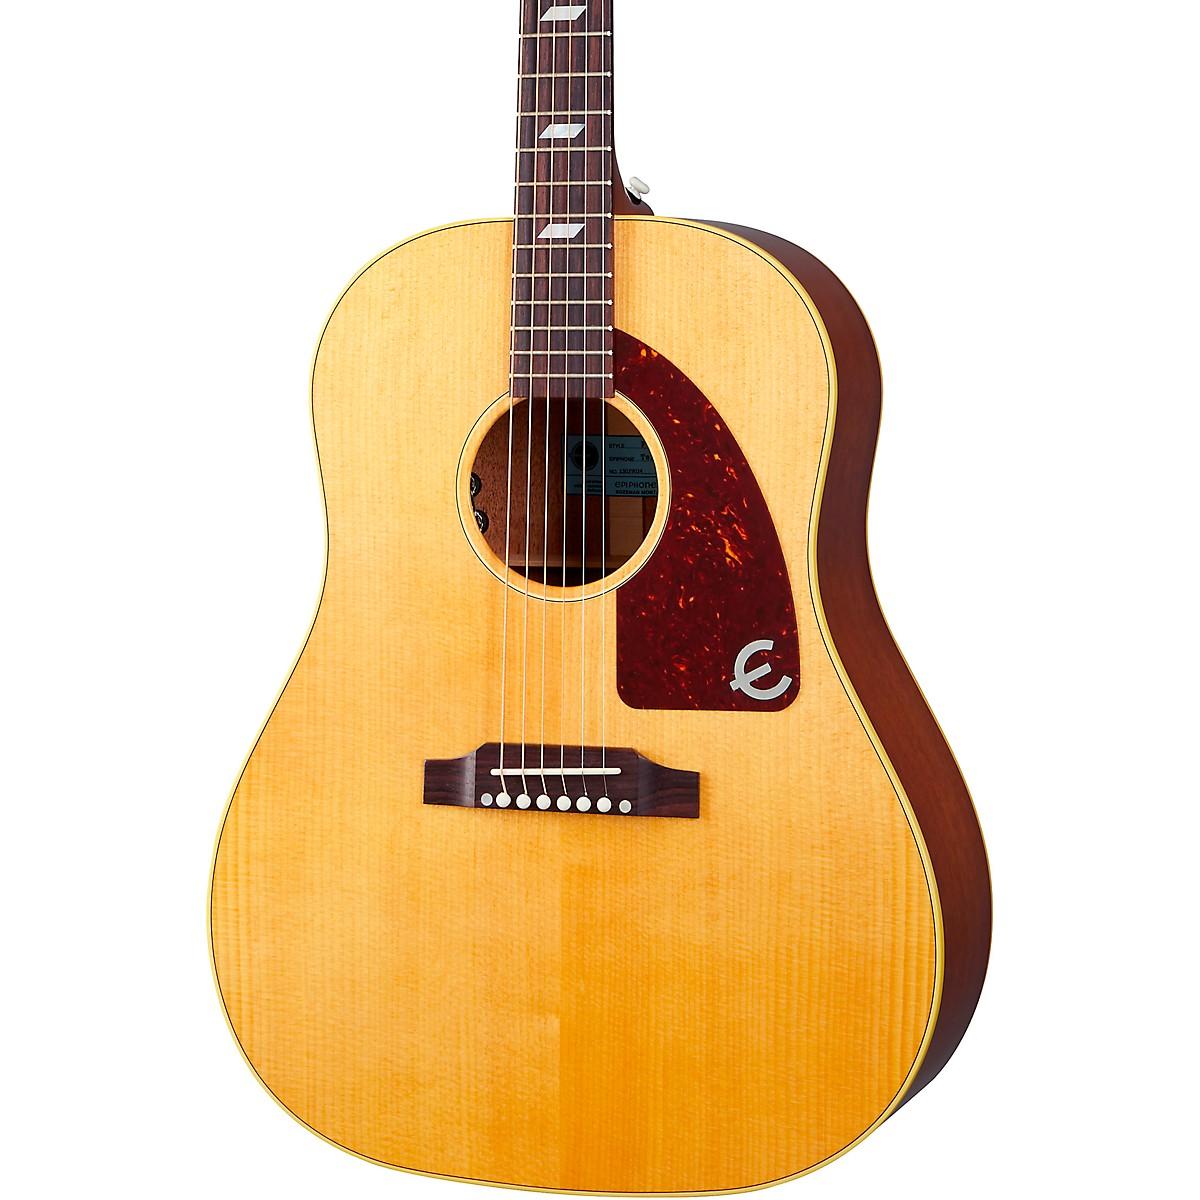 Epiphone USA Texan Hollowbody Acoustic-Electric Guitar